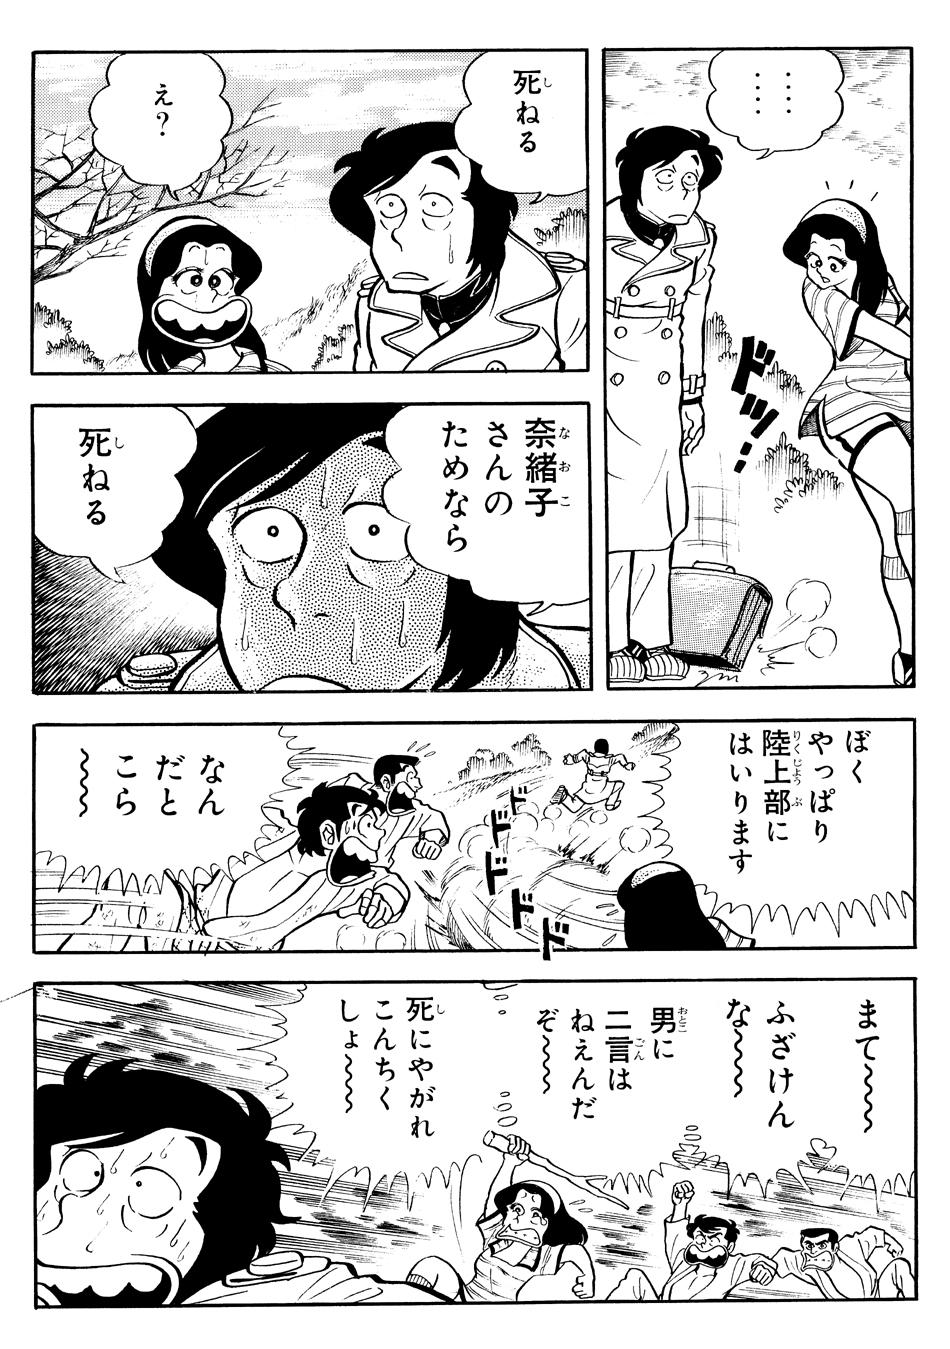 sanshiro_07